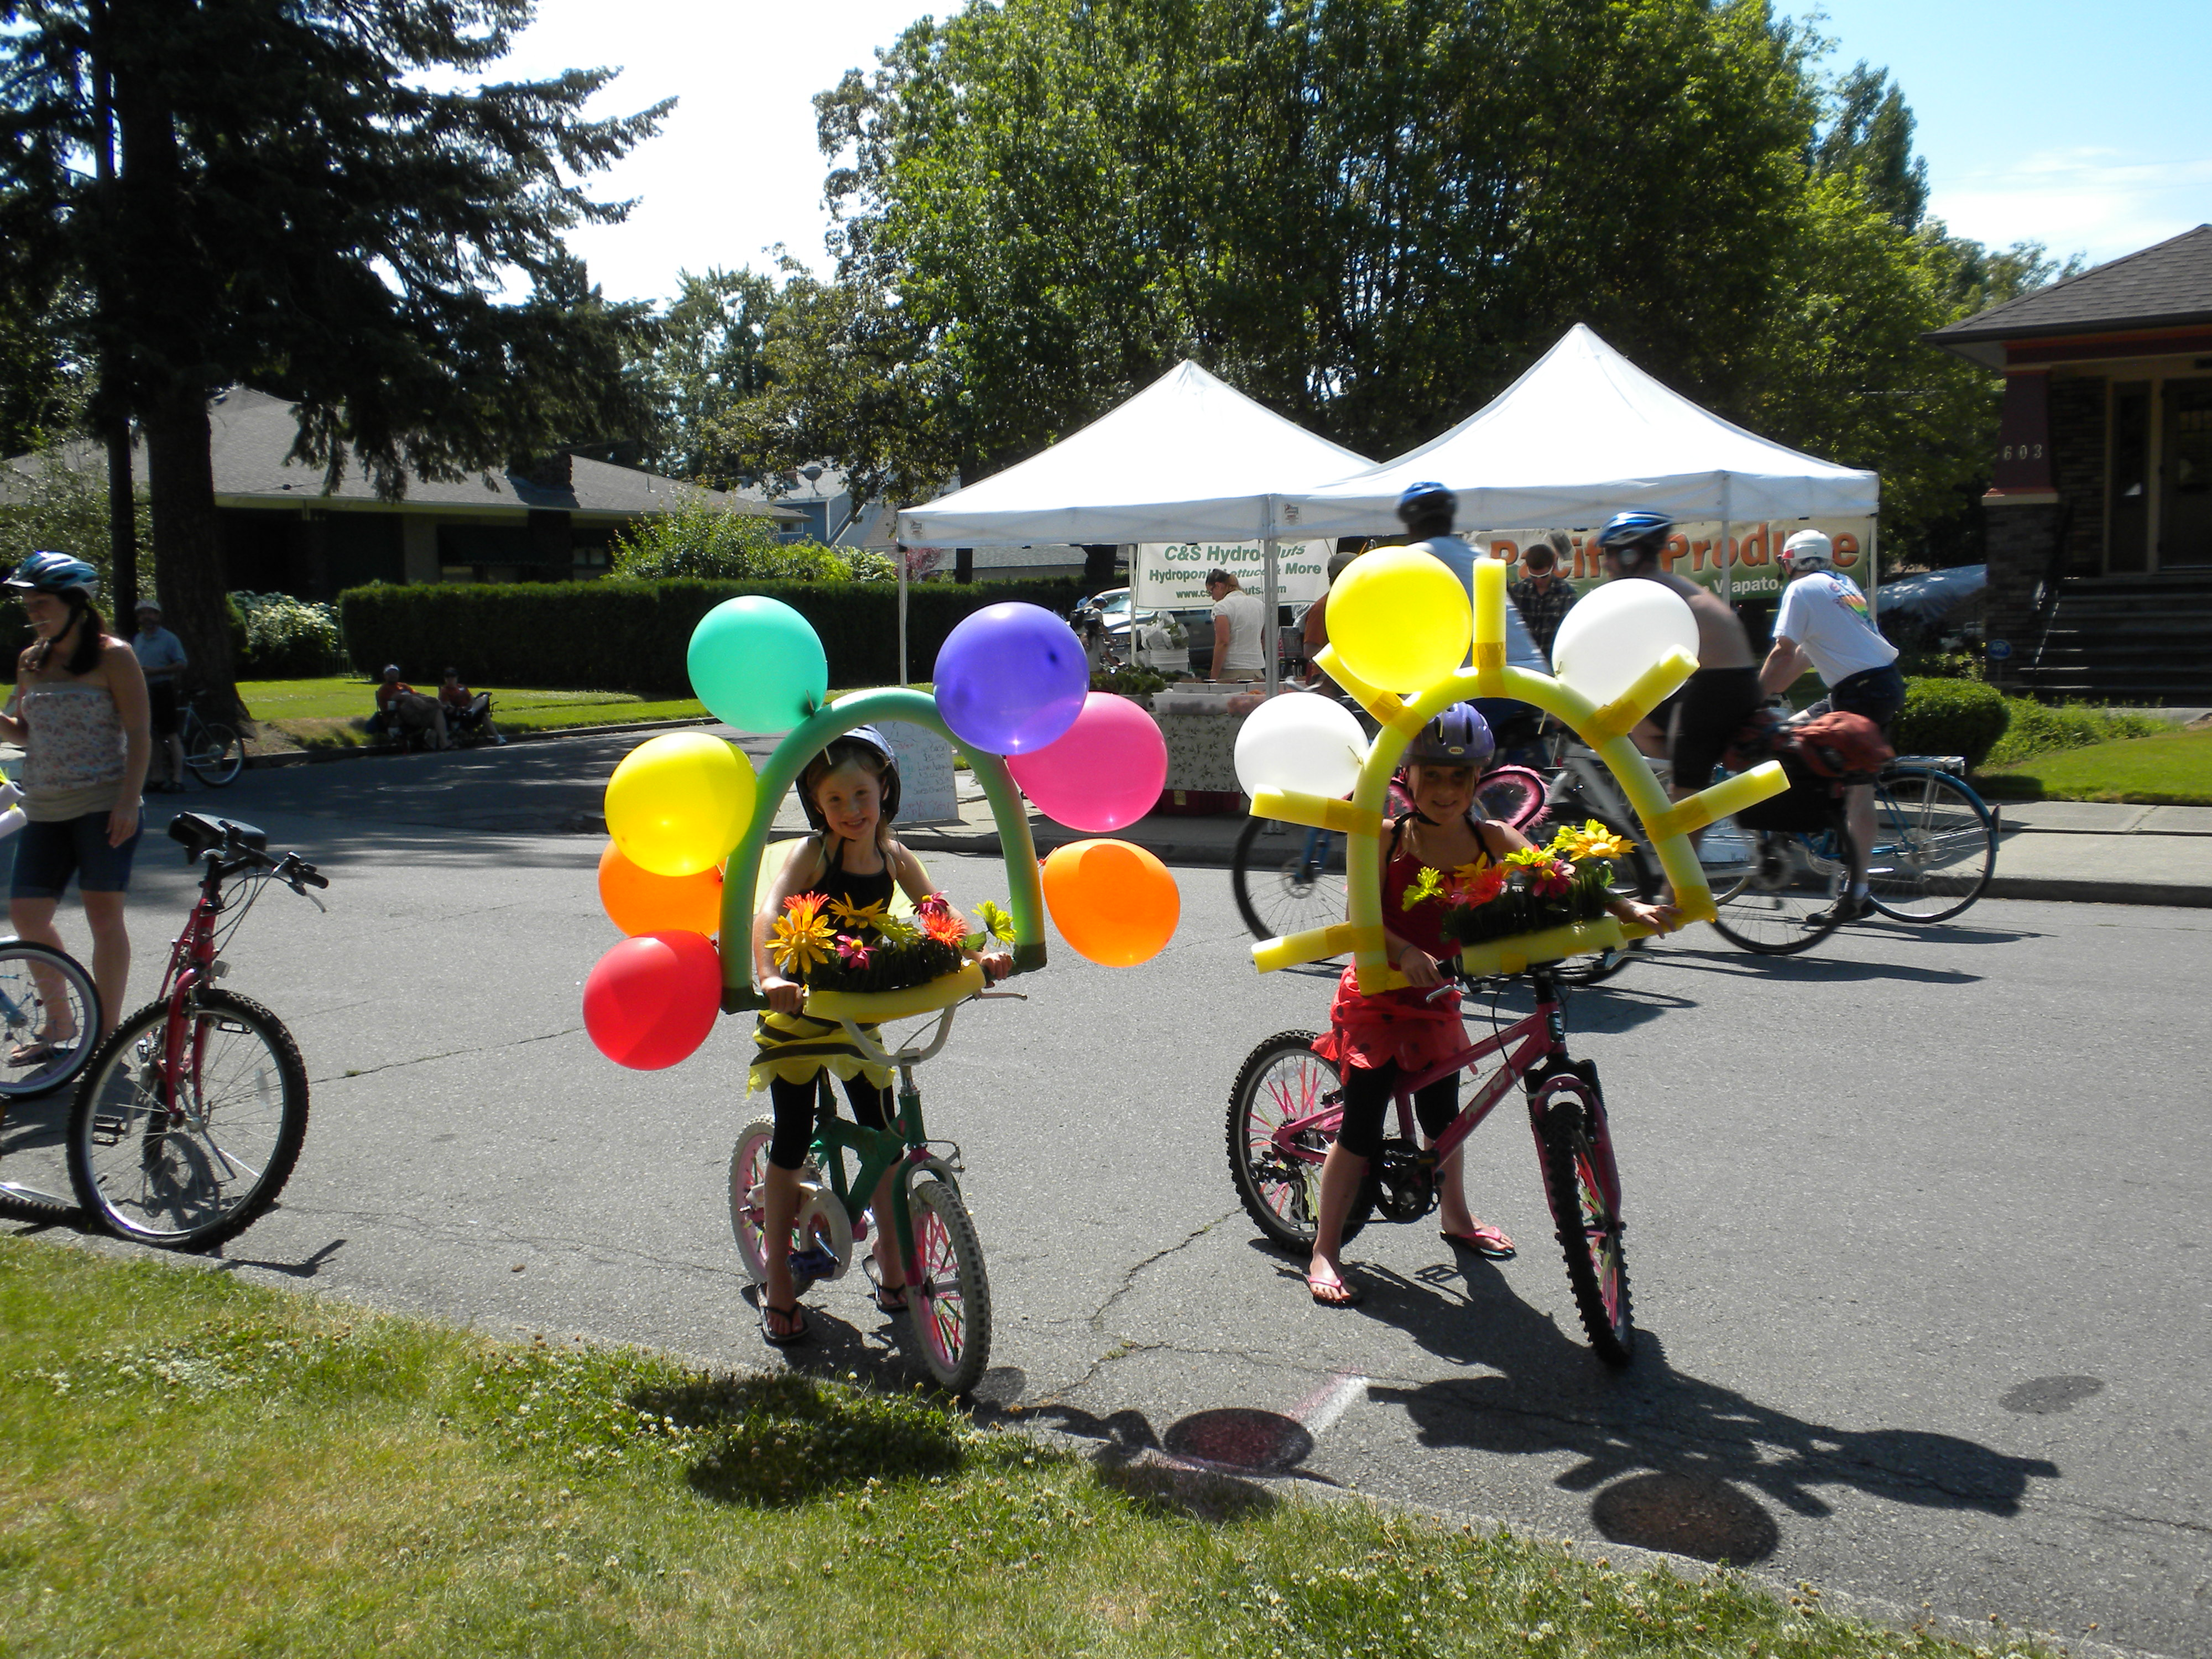 Bike Decorating Rides again on June 22, 2011